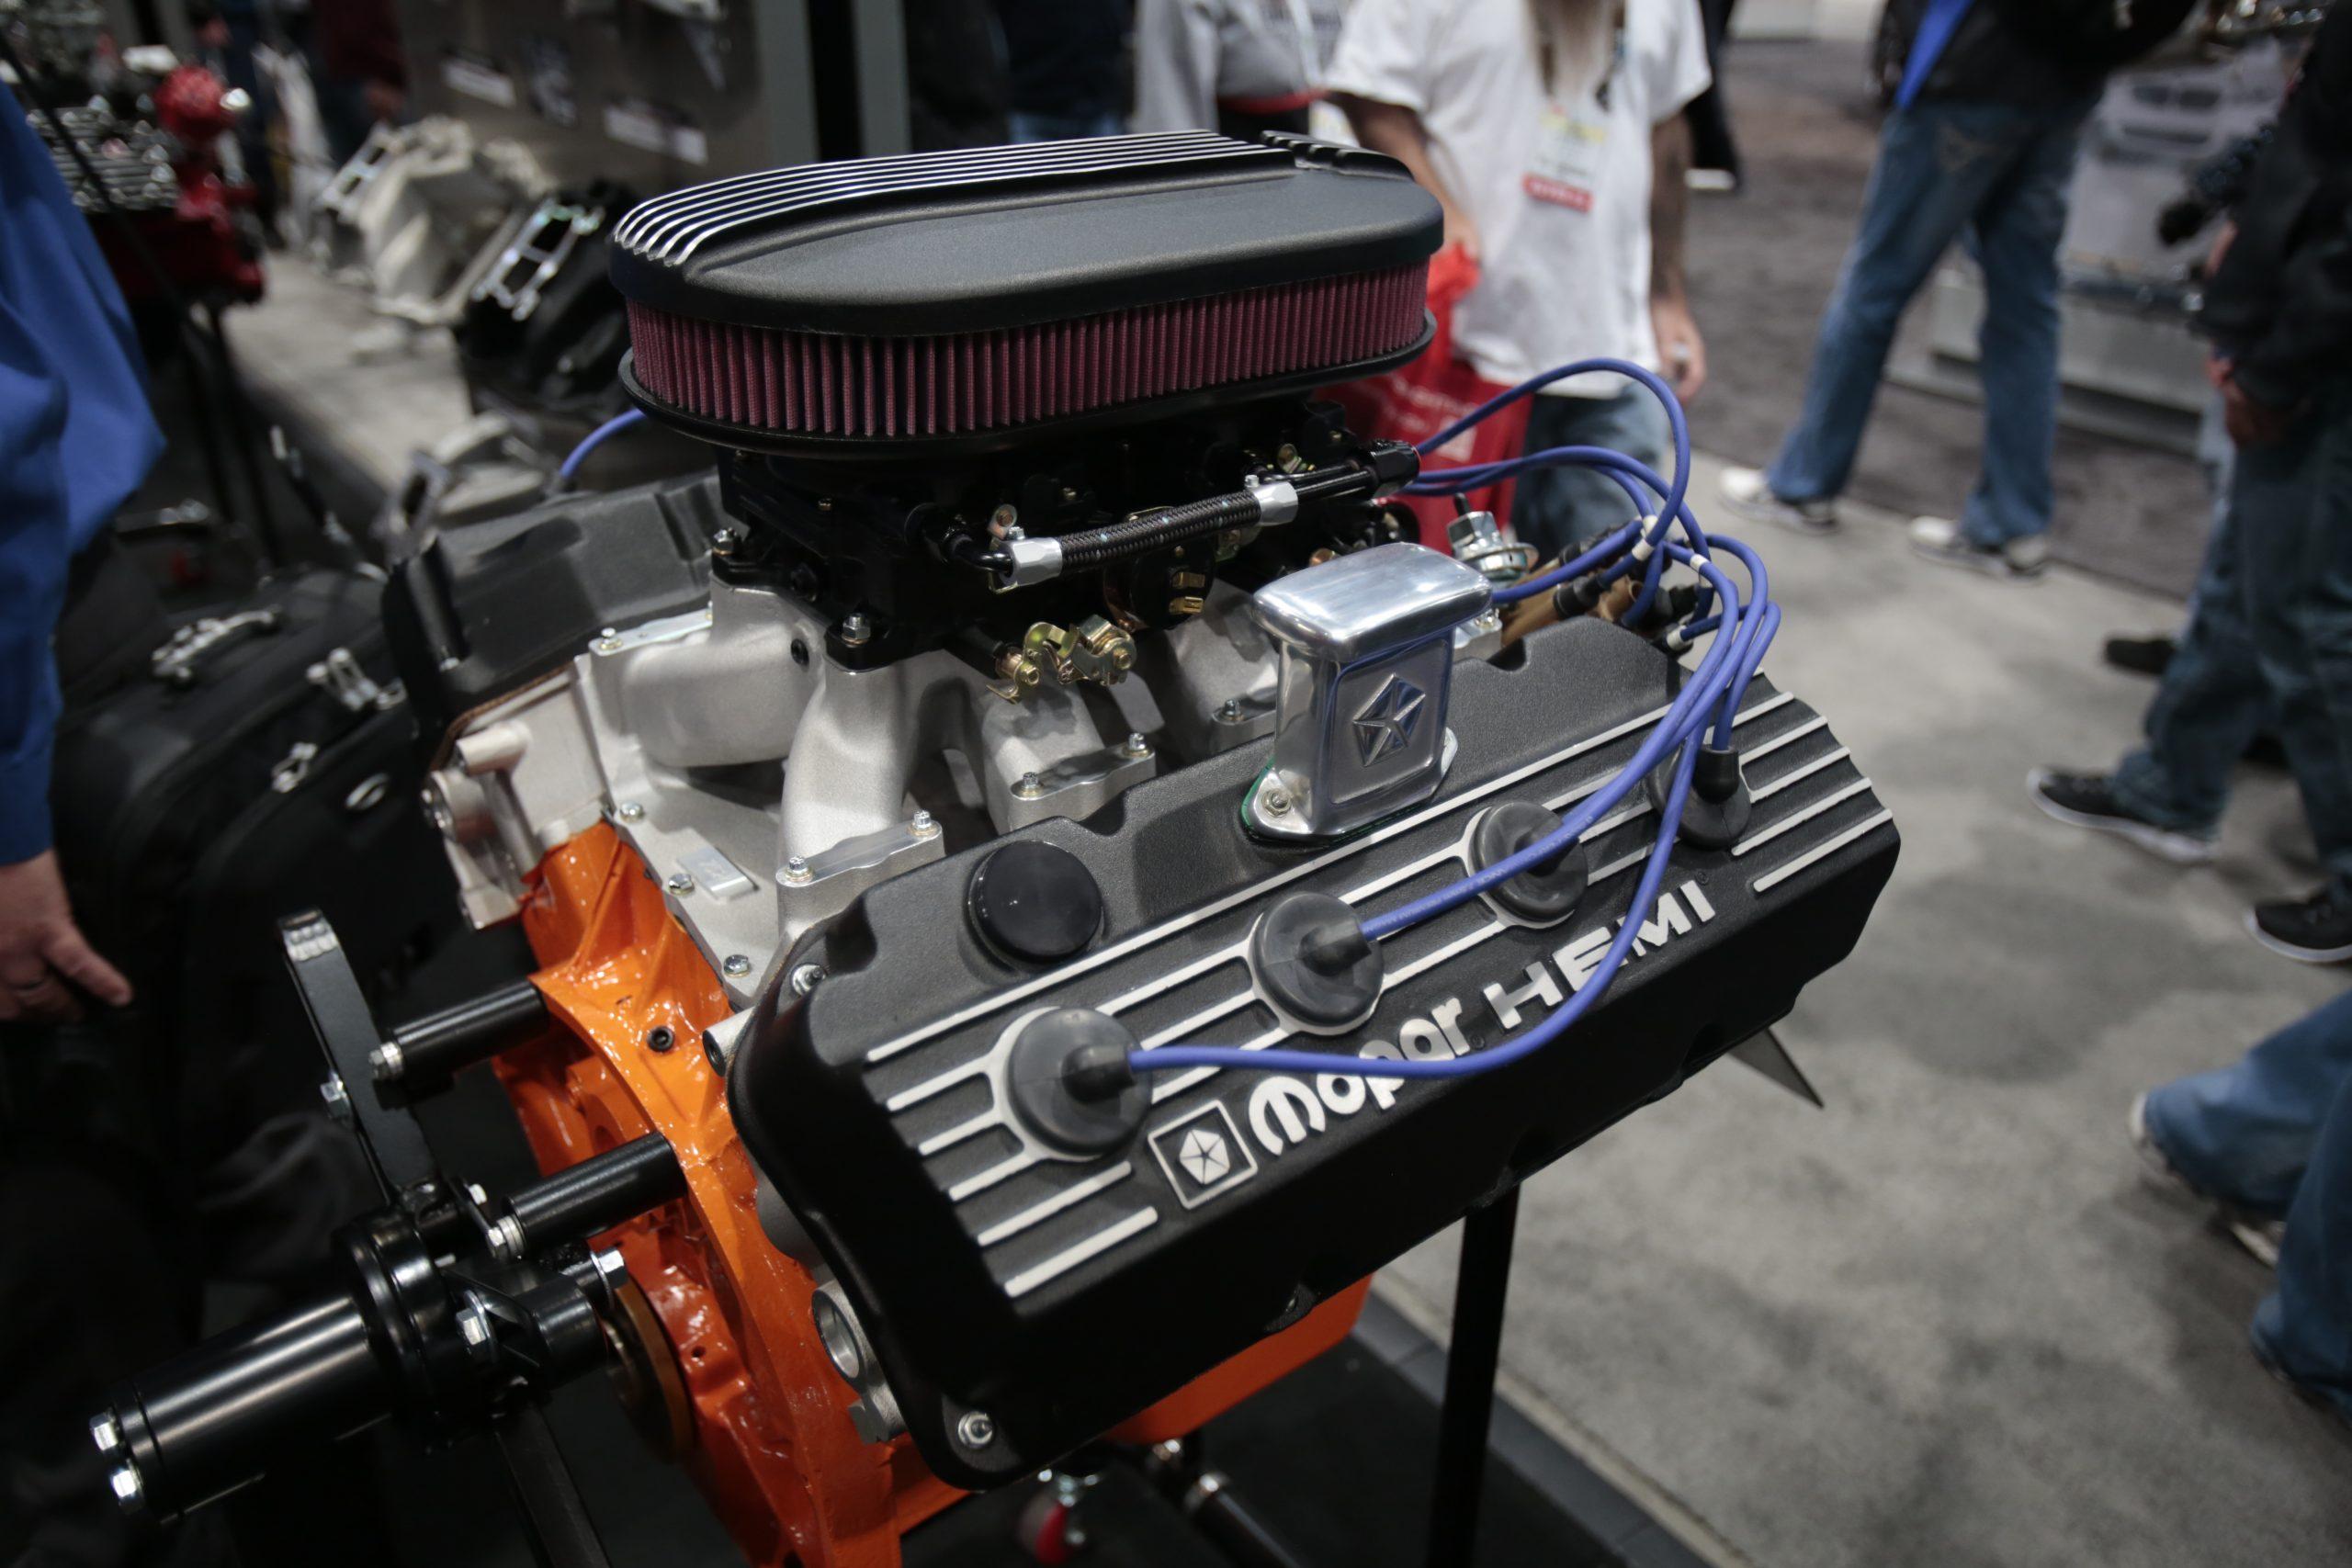 Gen 2 Hemi 426 engine